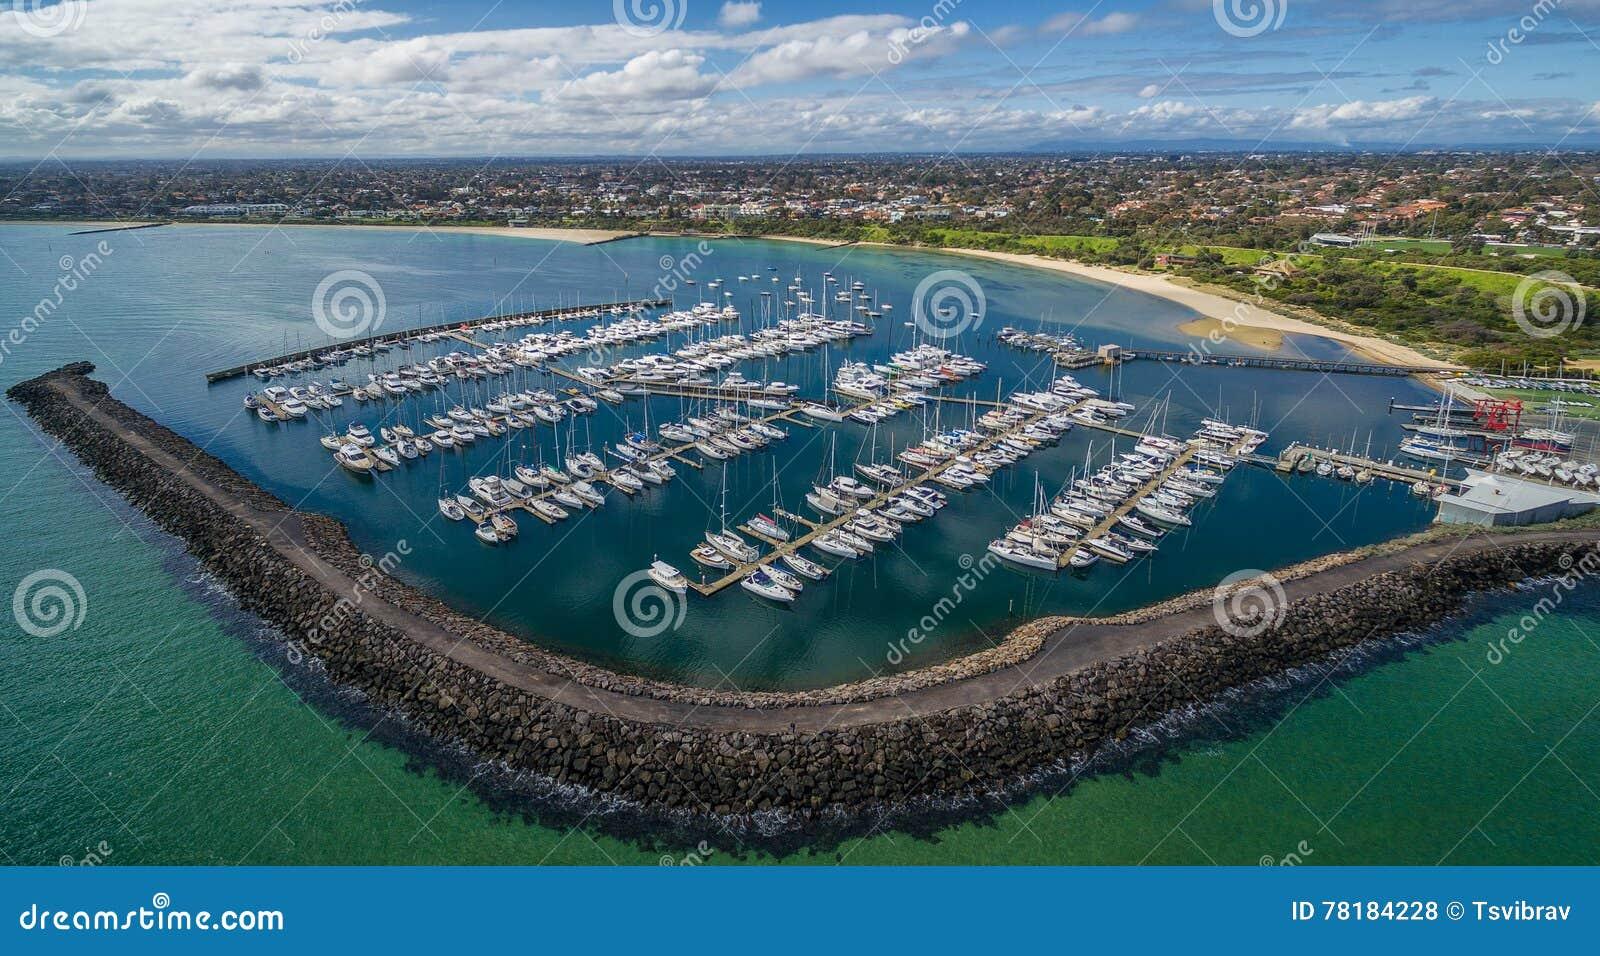 Imagem aérea do yacht club de Sandringham